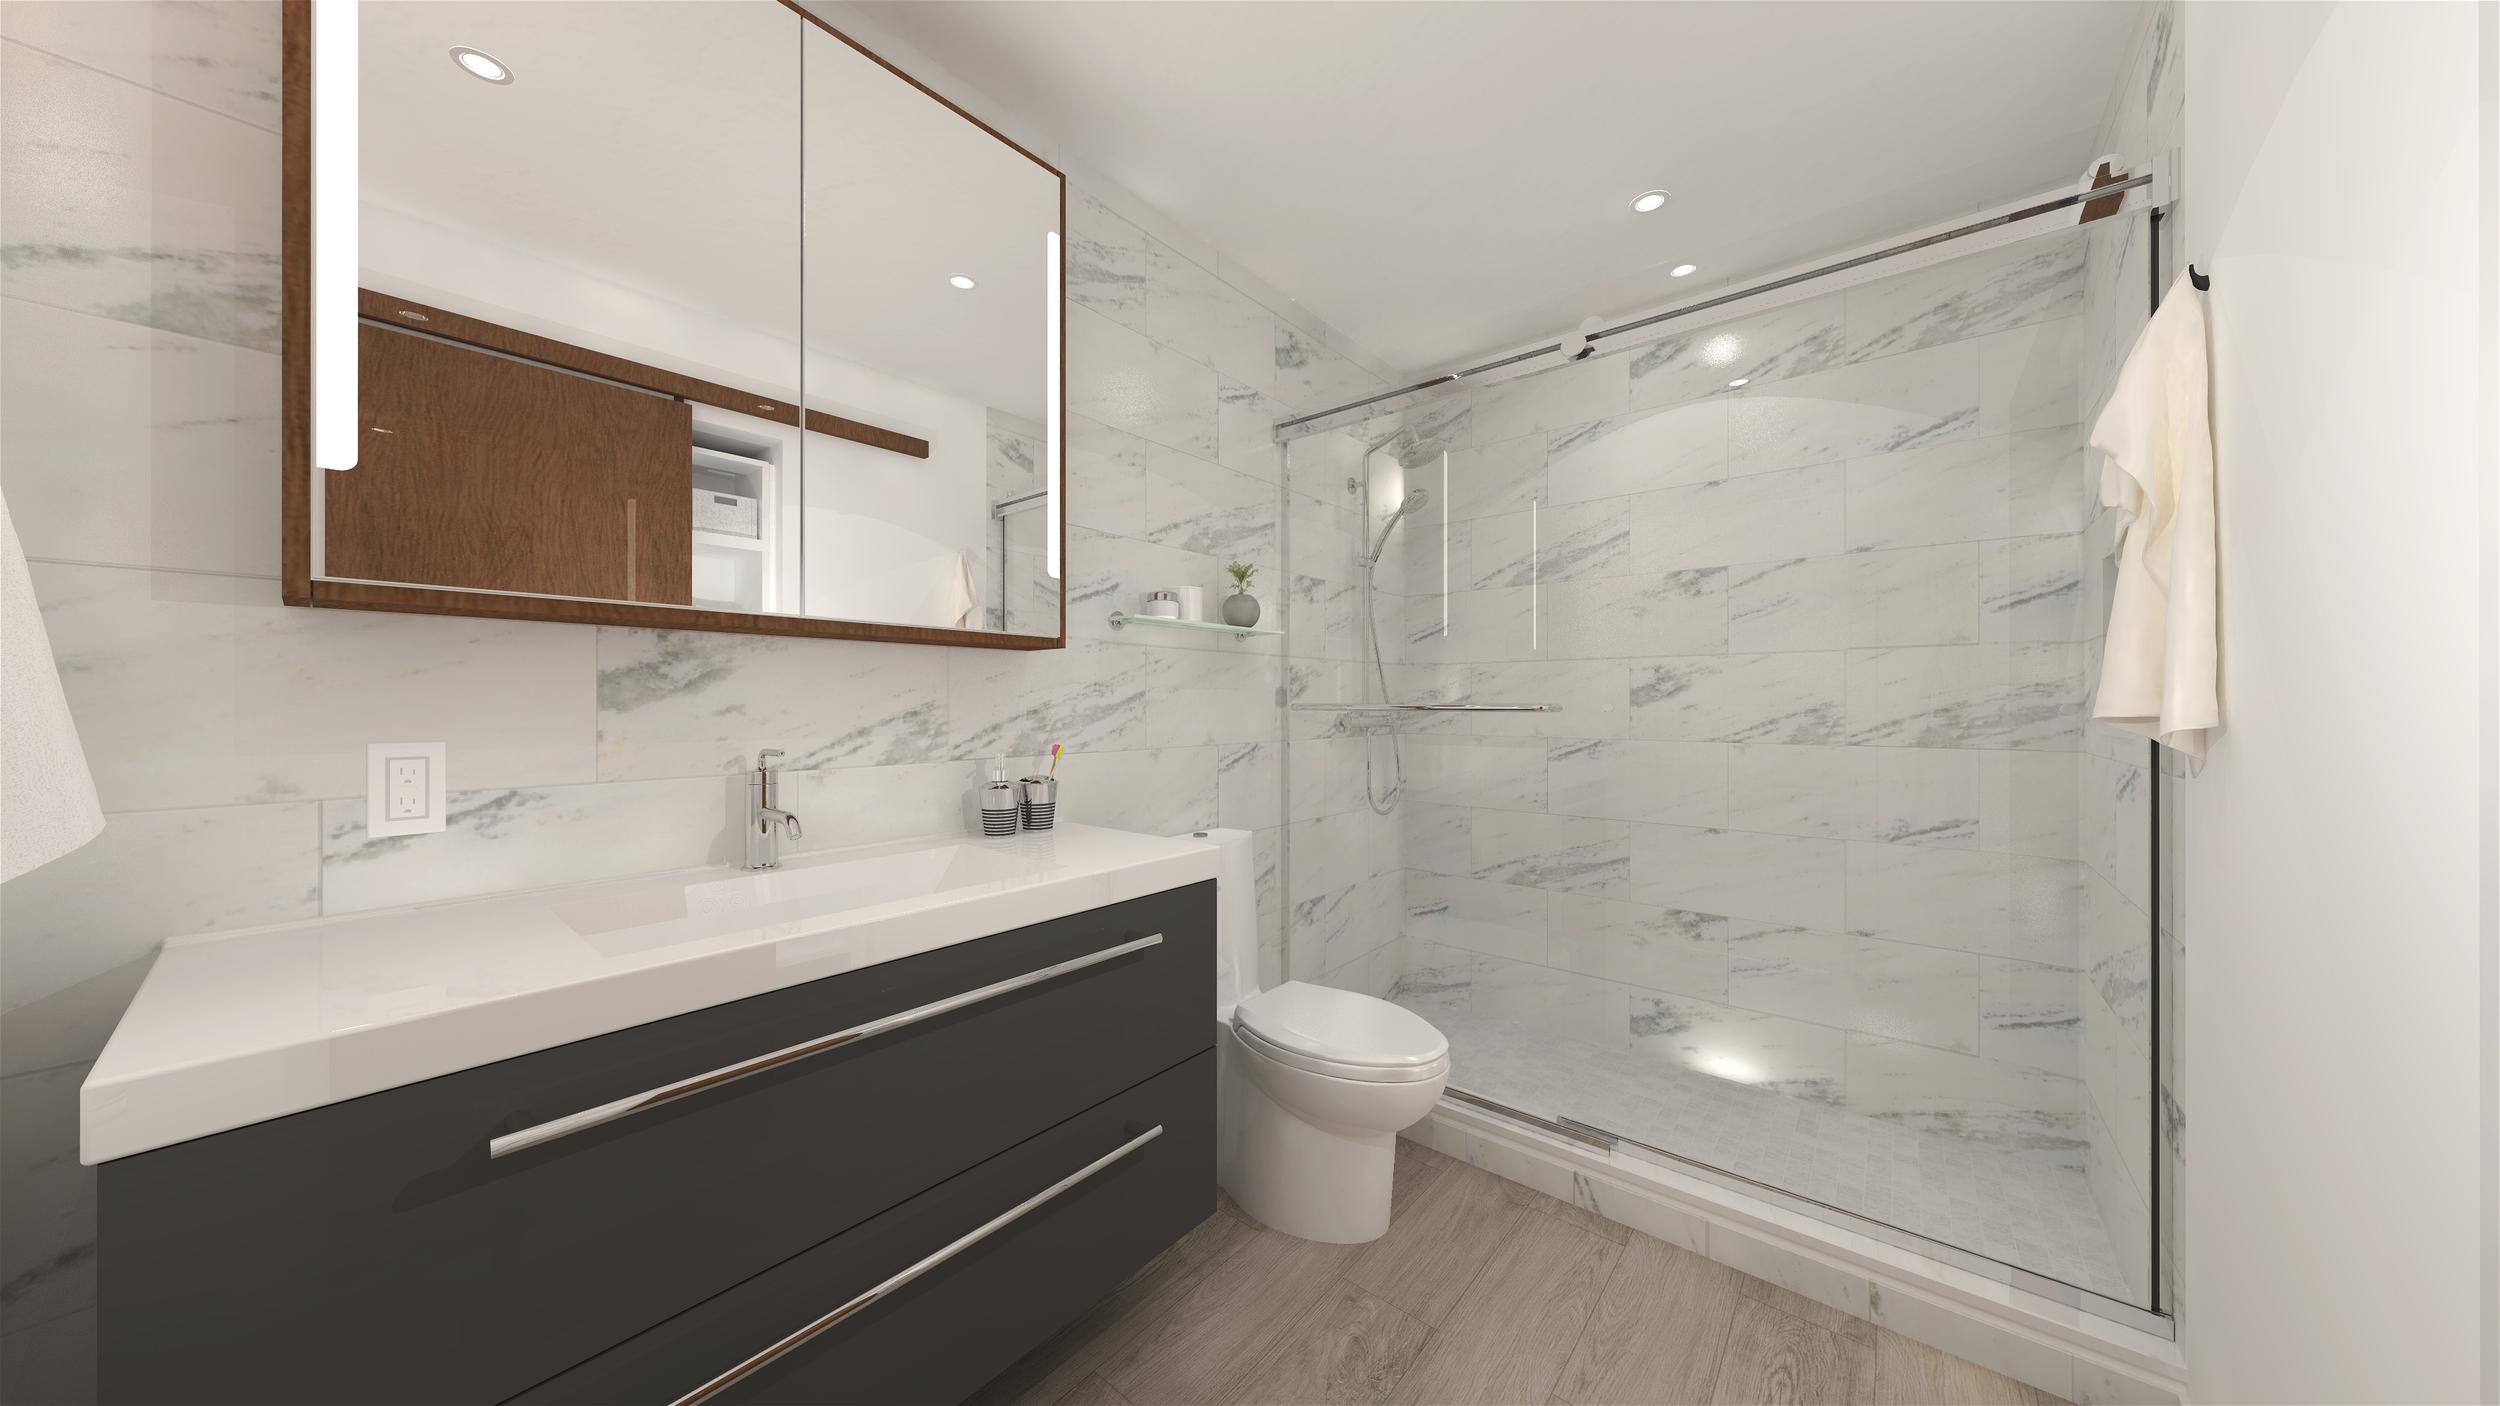 deSousaDESIGN_Bathroom_Small_Lux_V1a_3840_2160.png